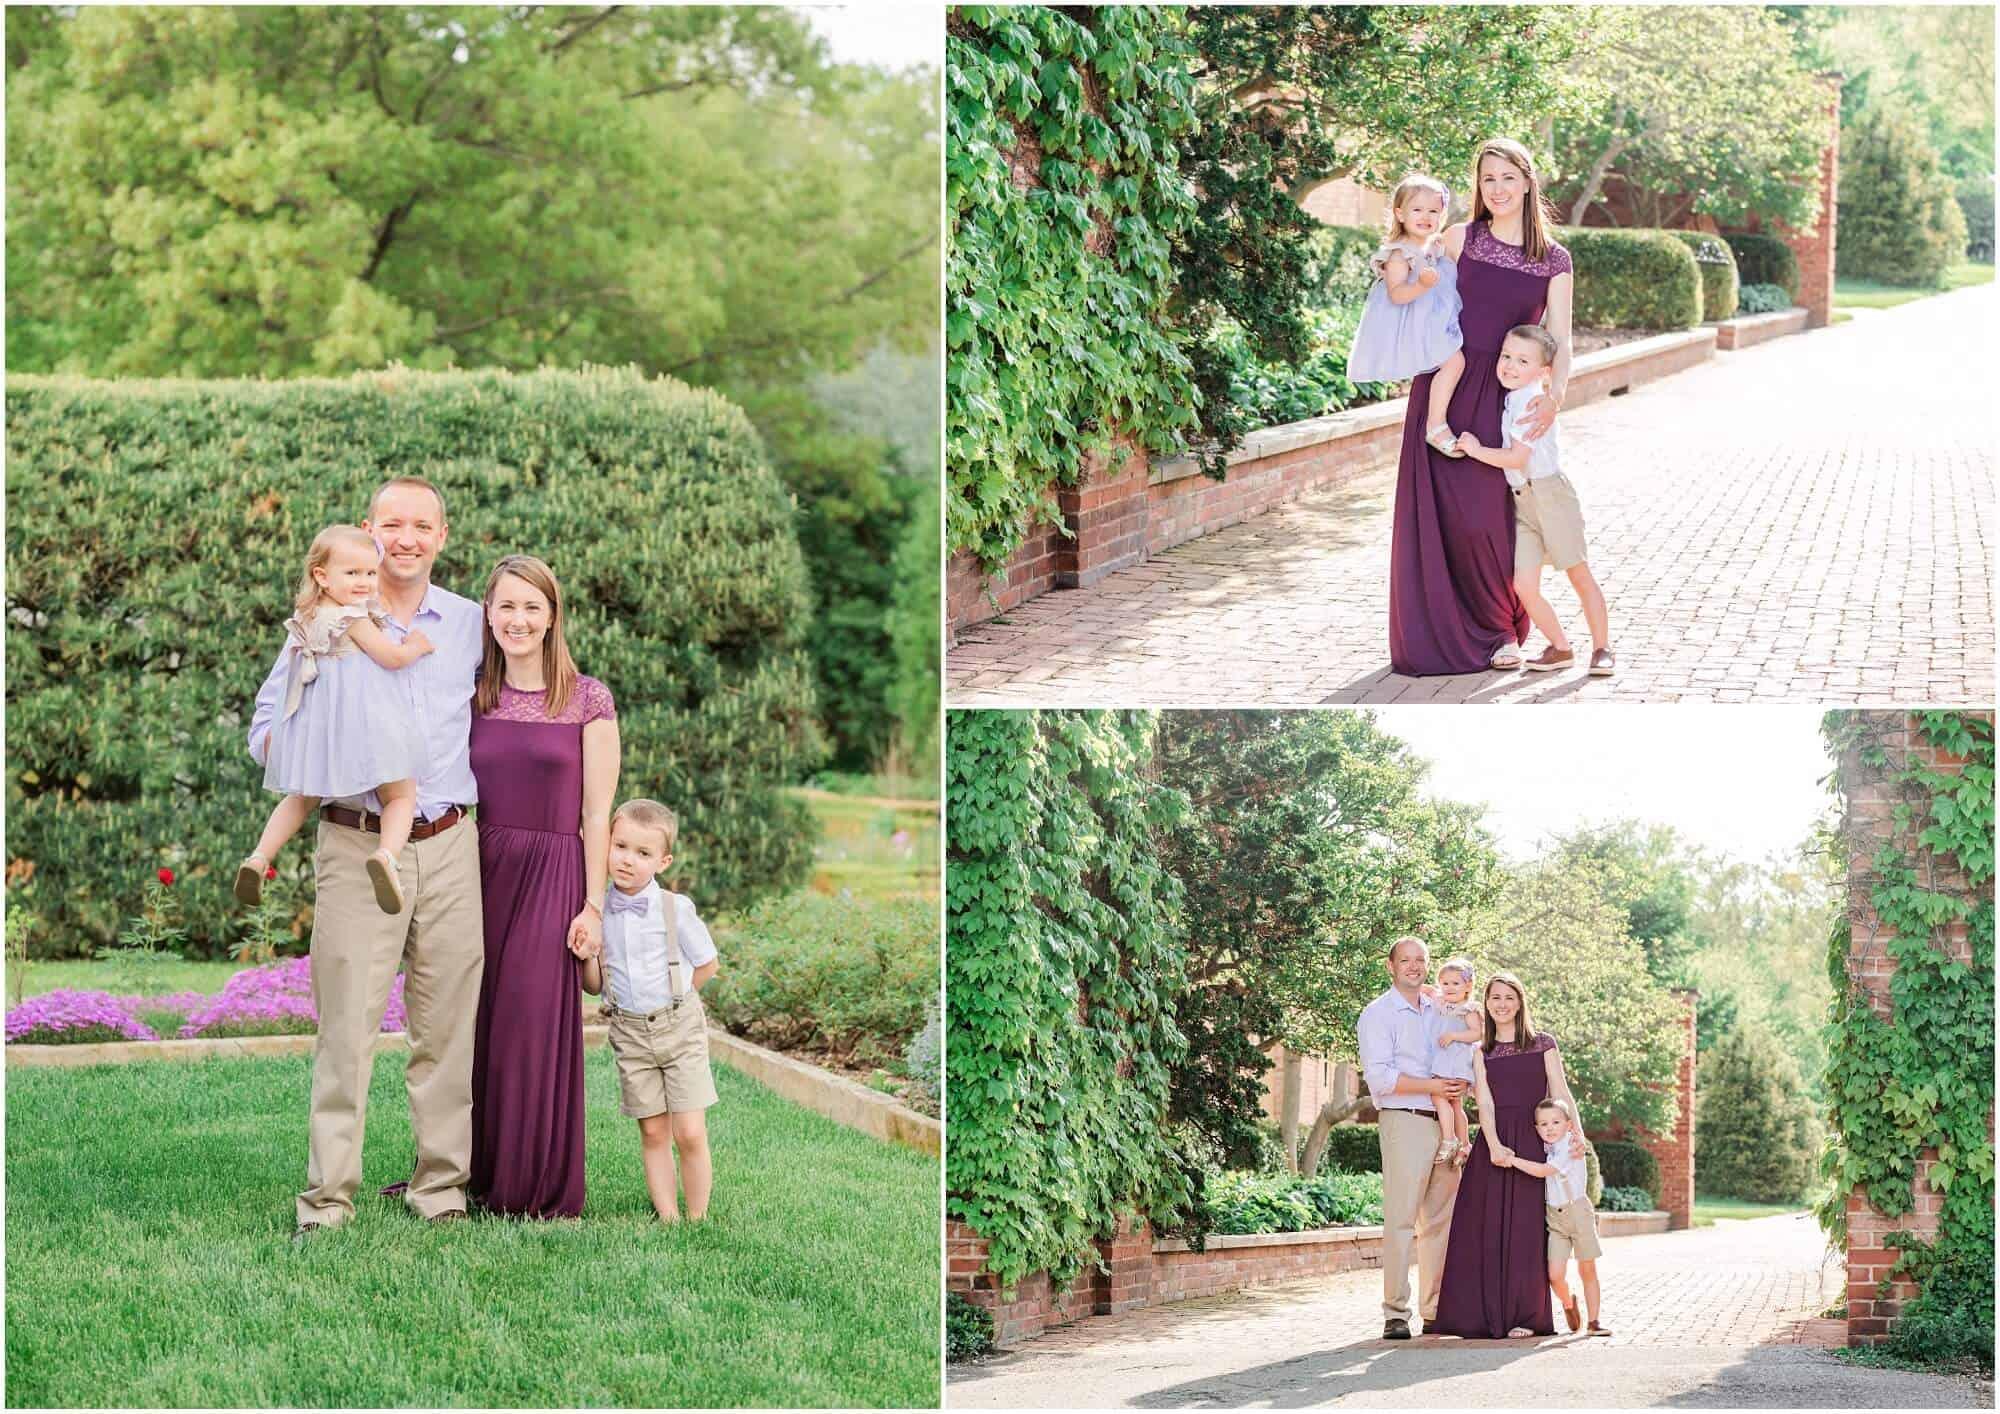 springtime family photos at kingwood center mansfield ohio photographer